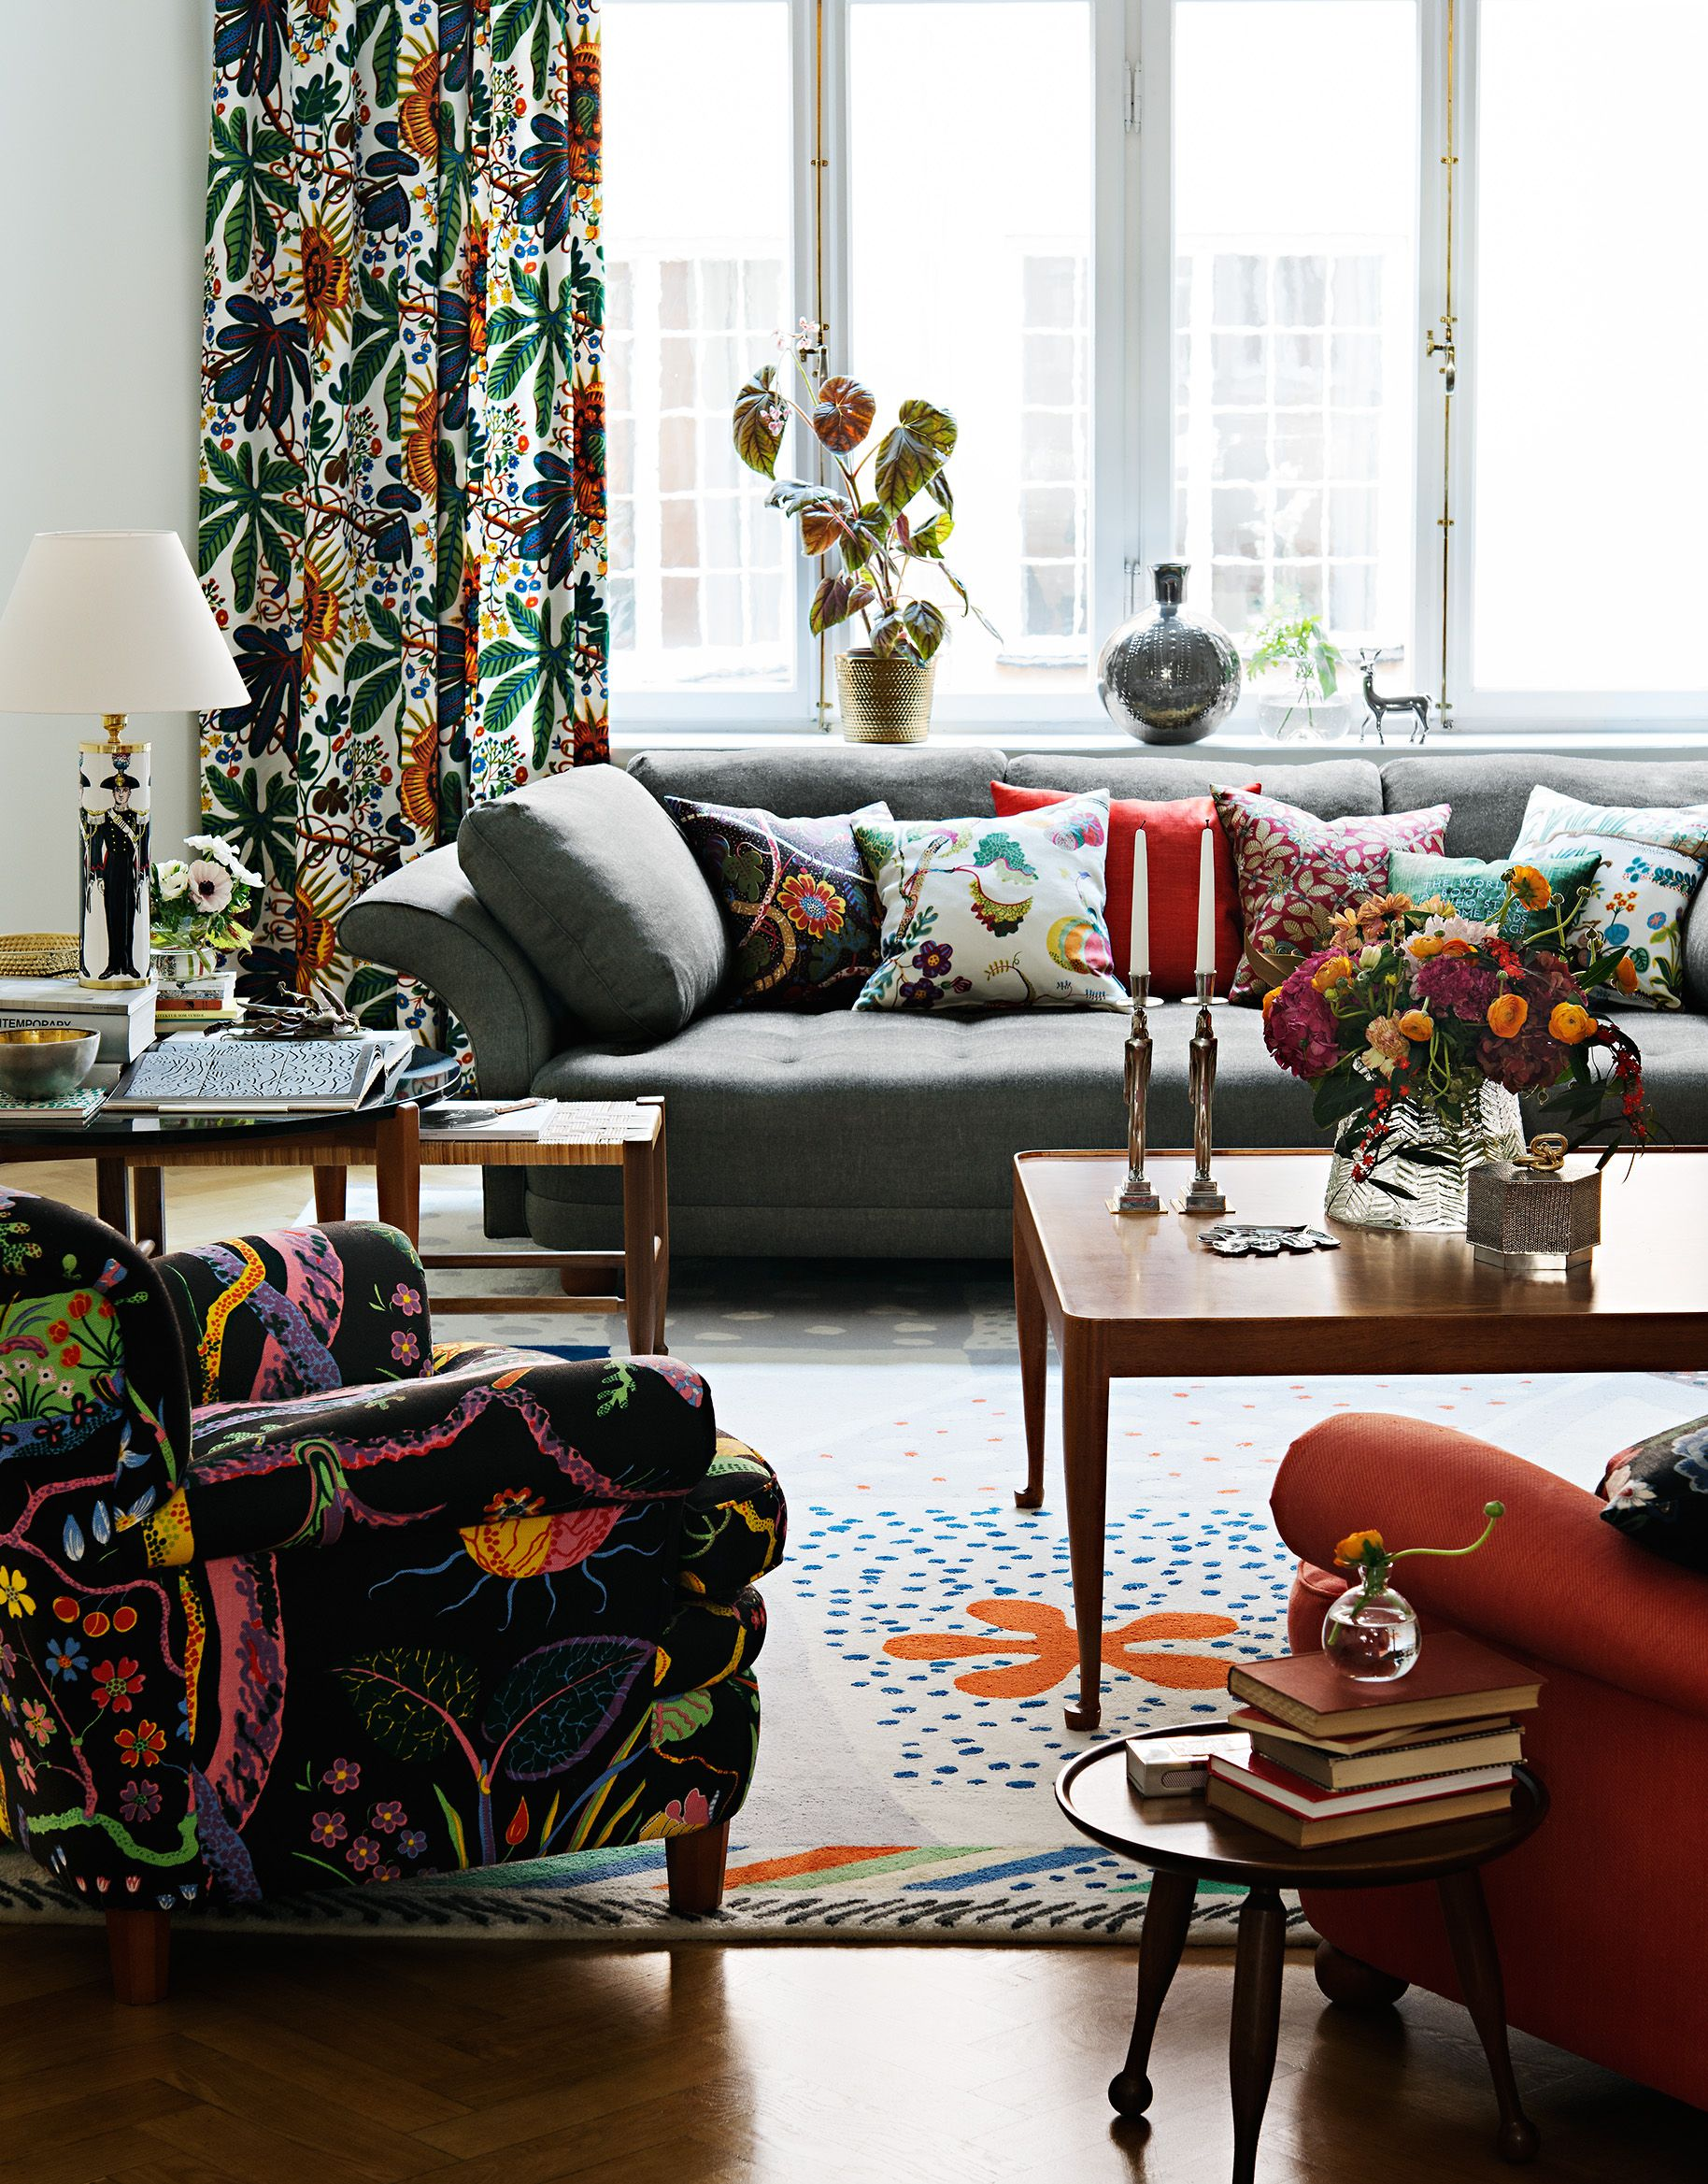 Autumn Living Room Decorating: Autumn Living Room, Svenskt Tenn.